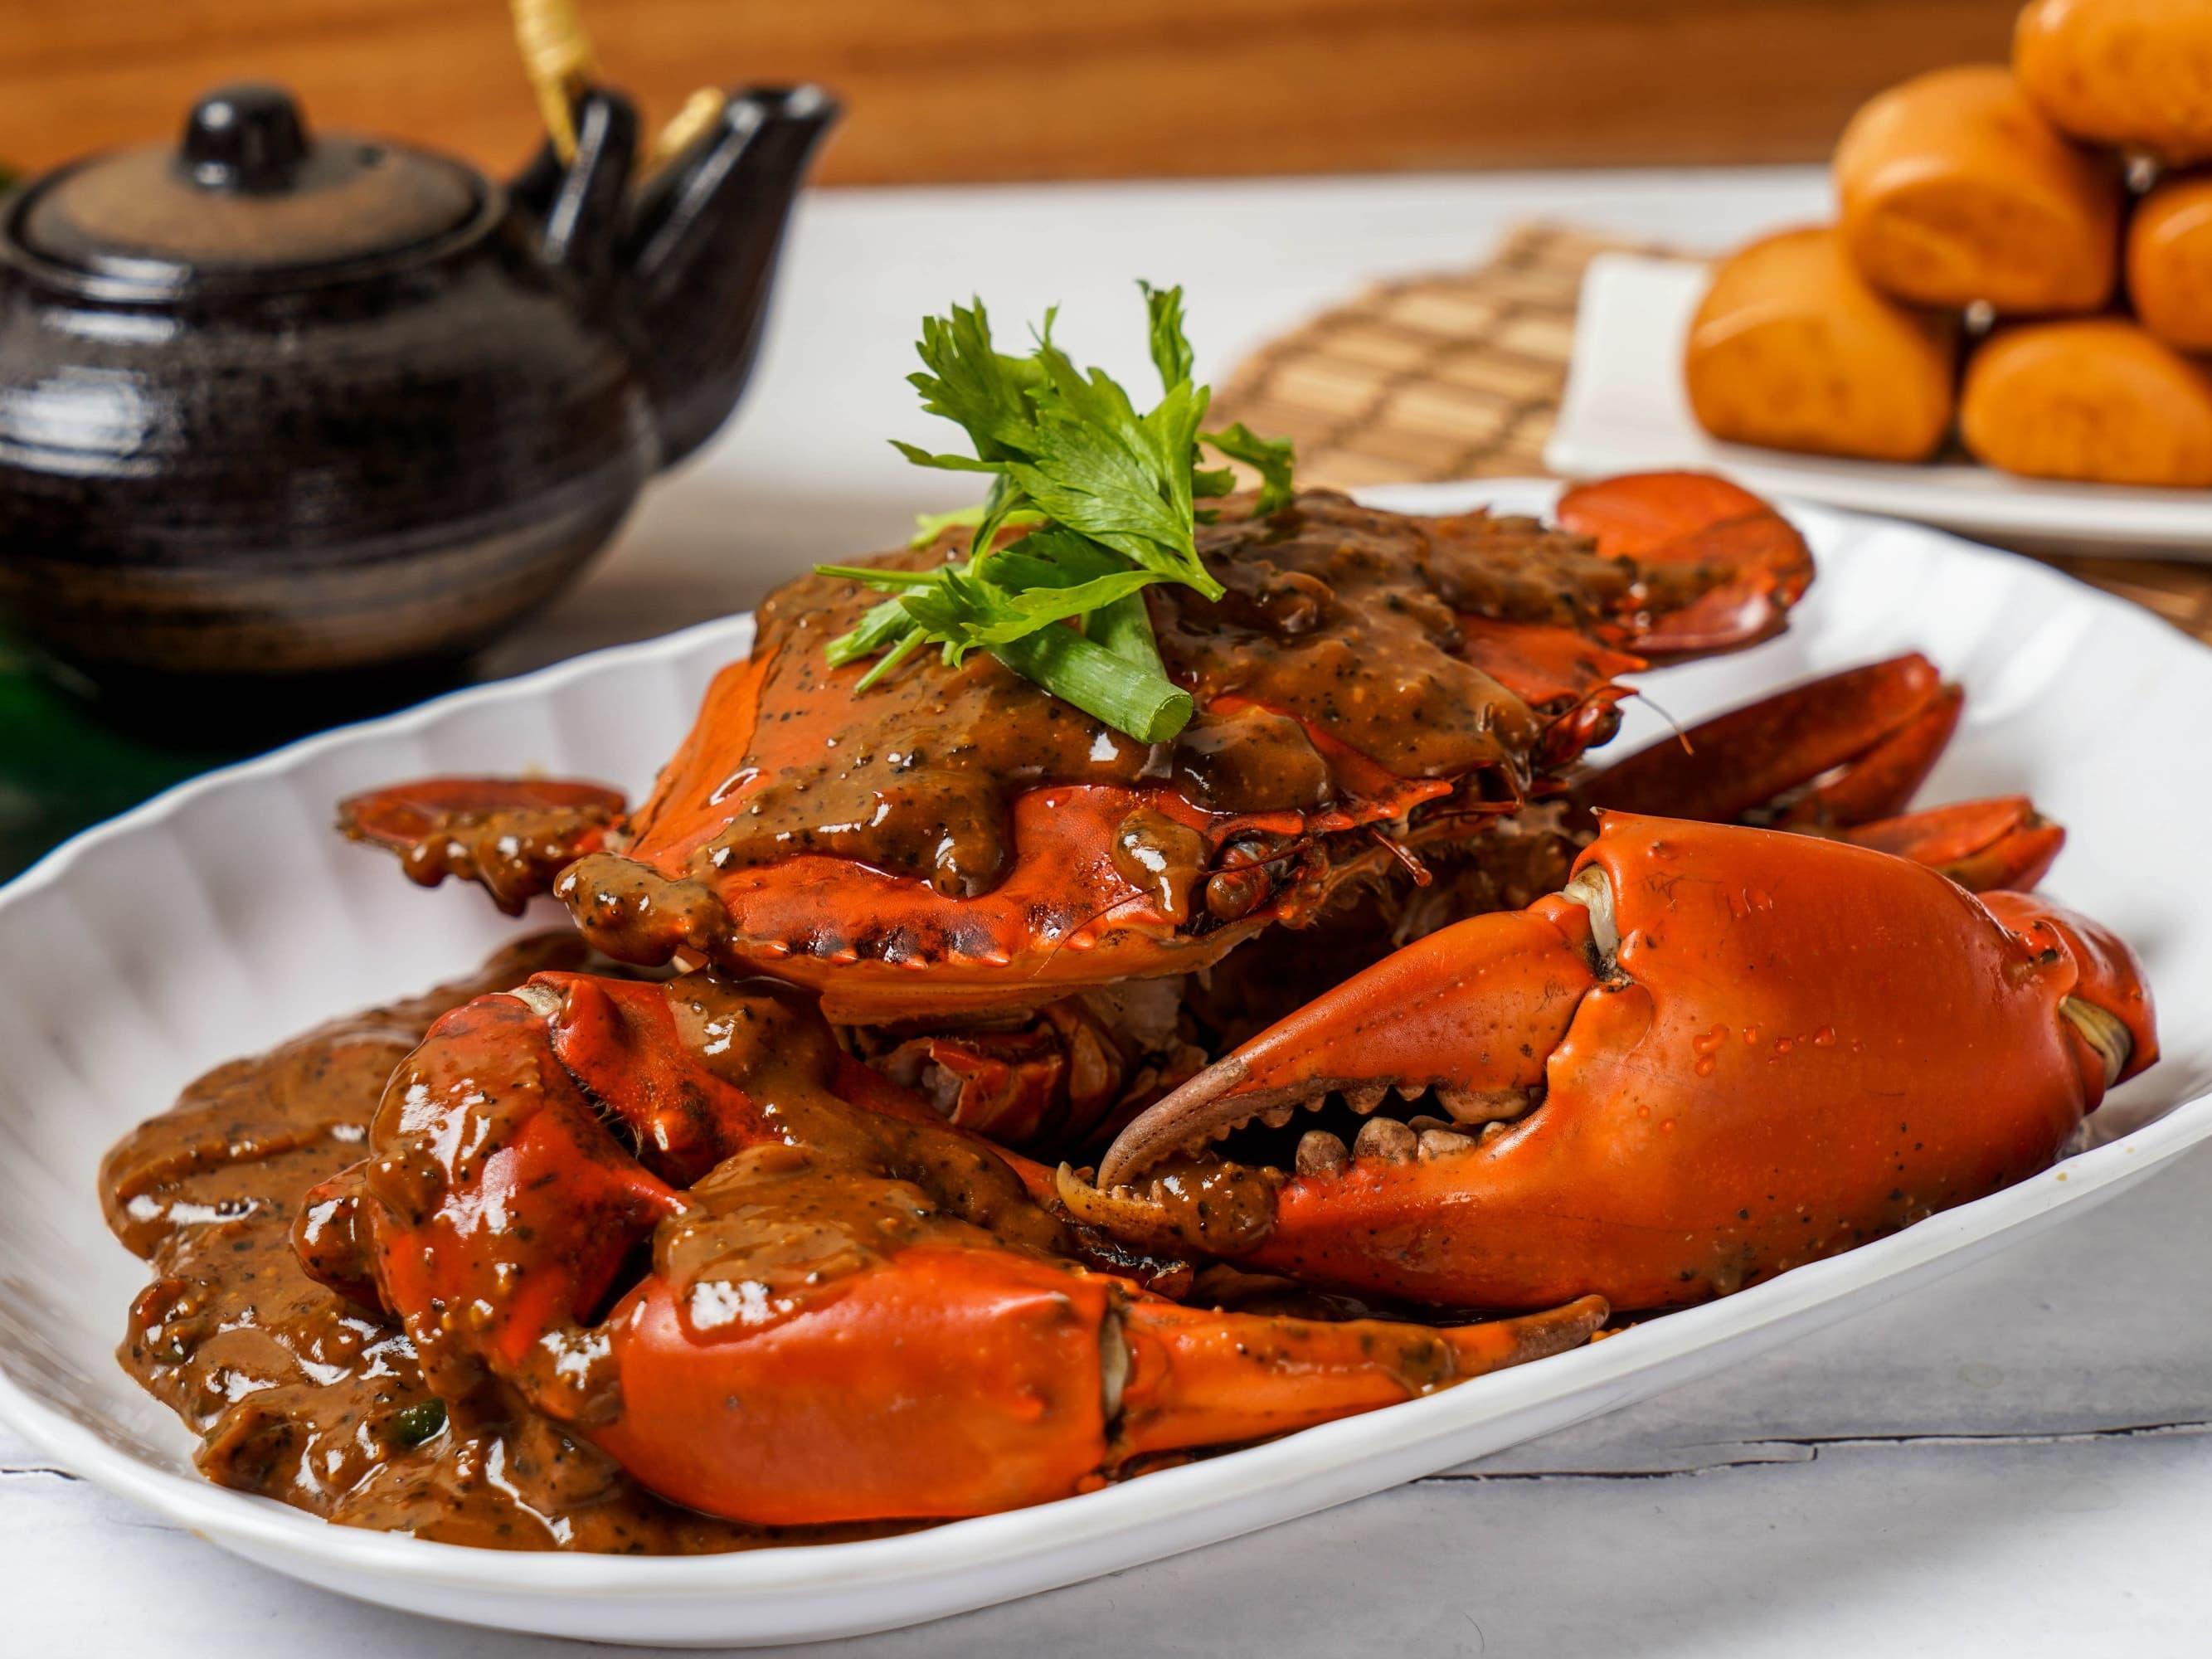 2 x Crabs + 12 x Mantou